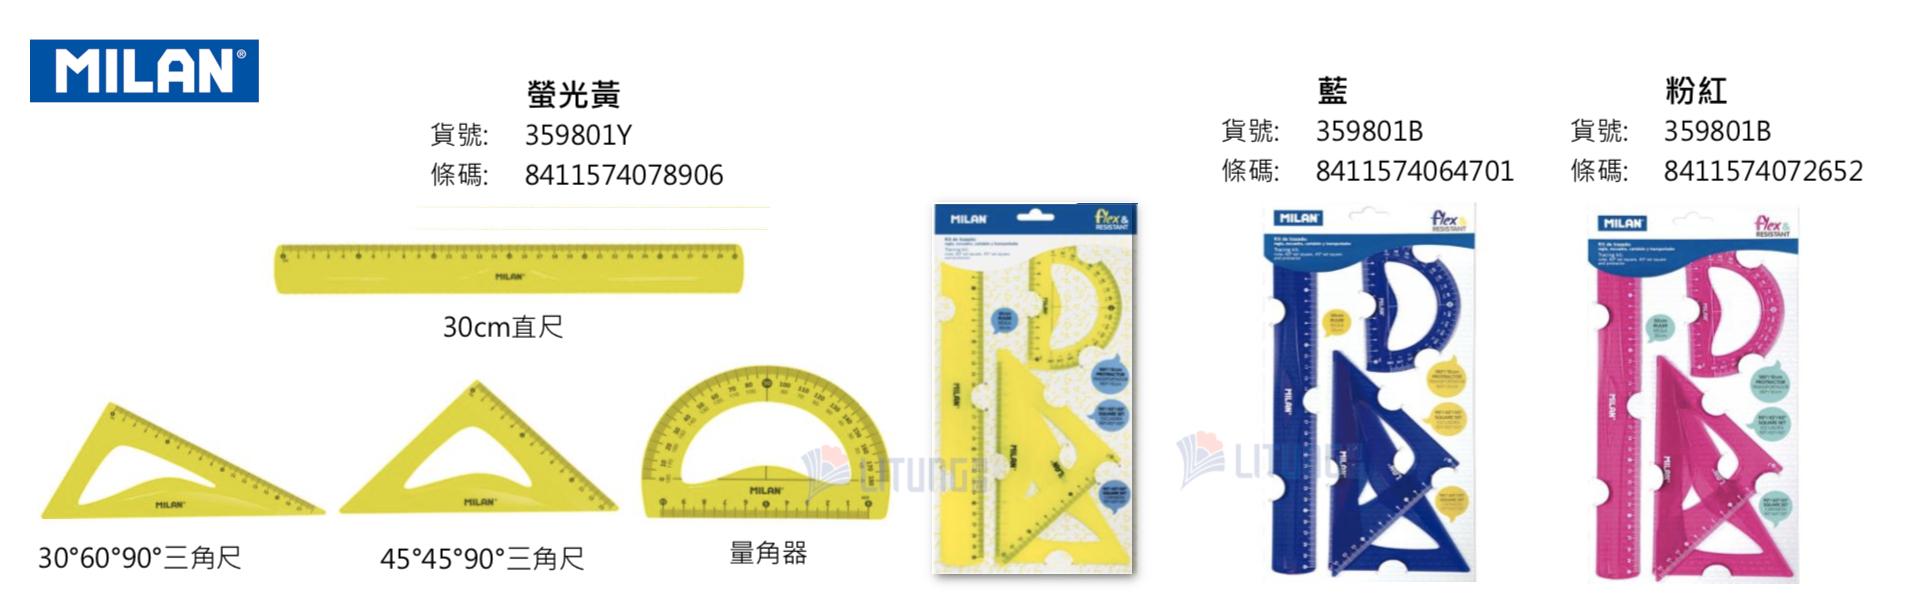 Milan359801防斷性套尺組合螢光黃LTLogo1920x600